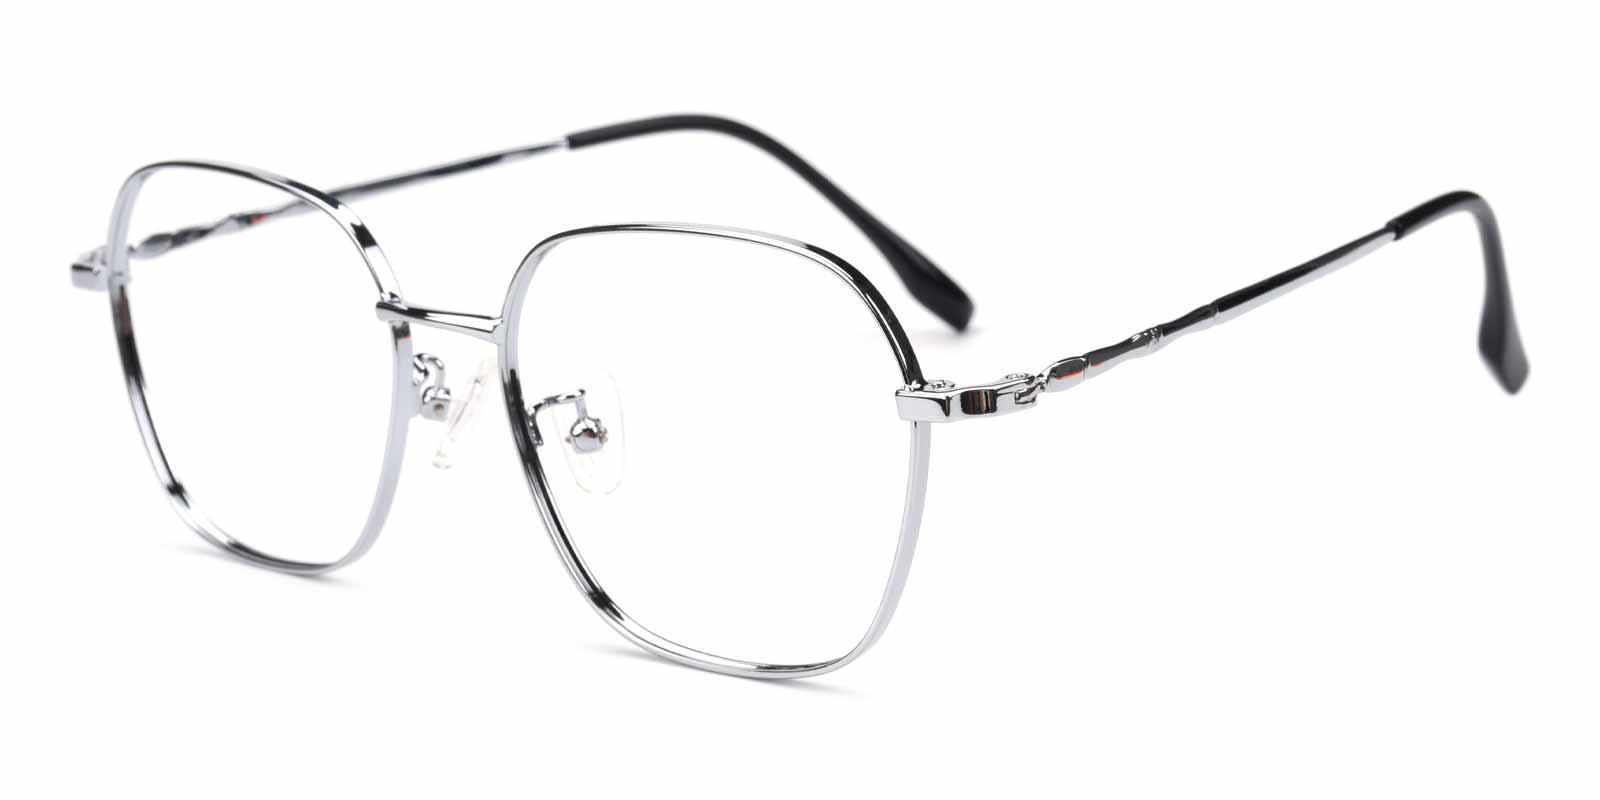 Aidan-Silver-Square-Metal-Eyeglasses-detail